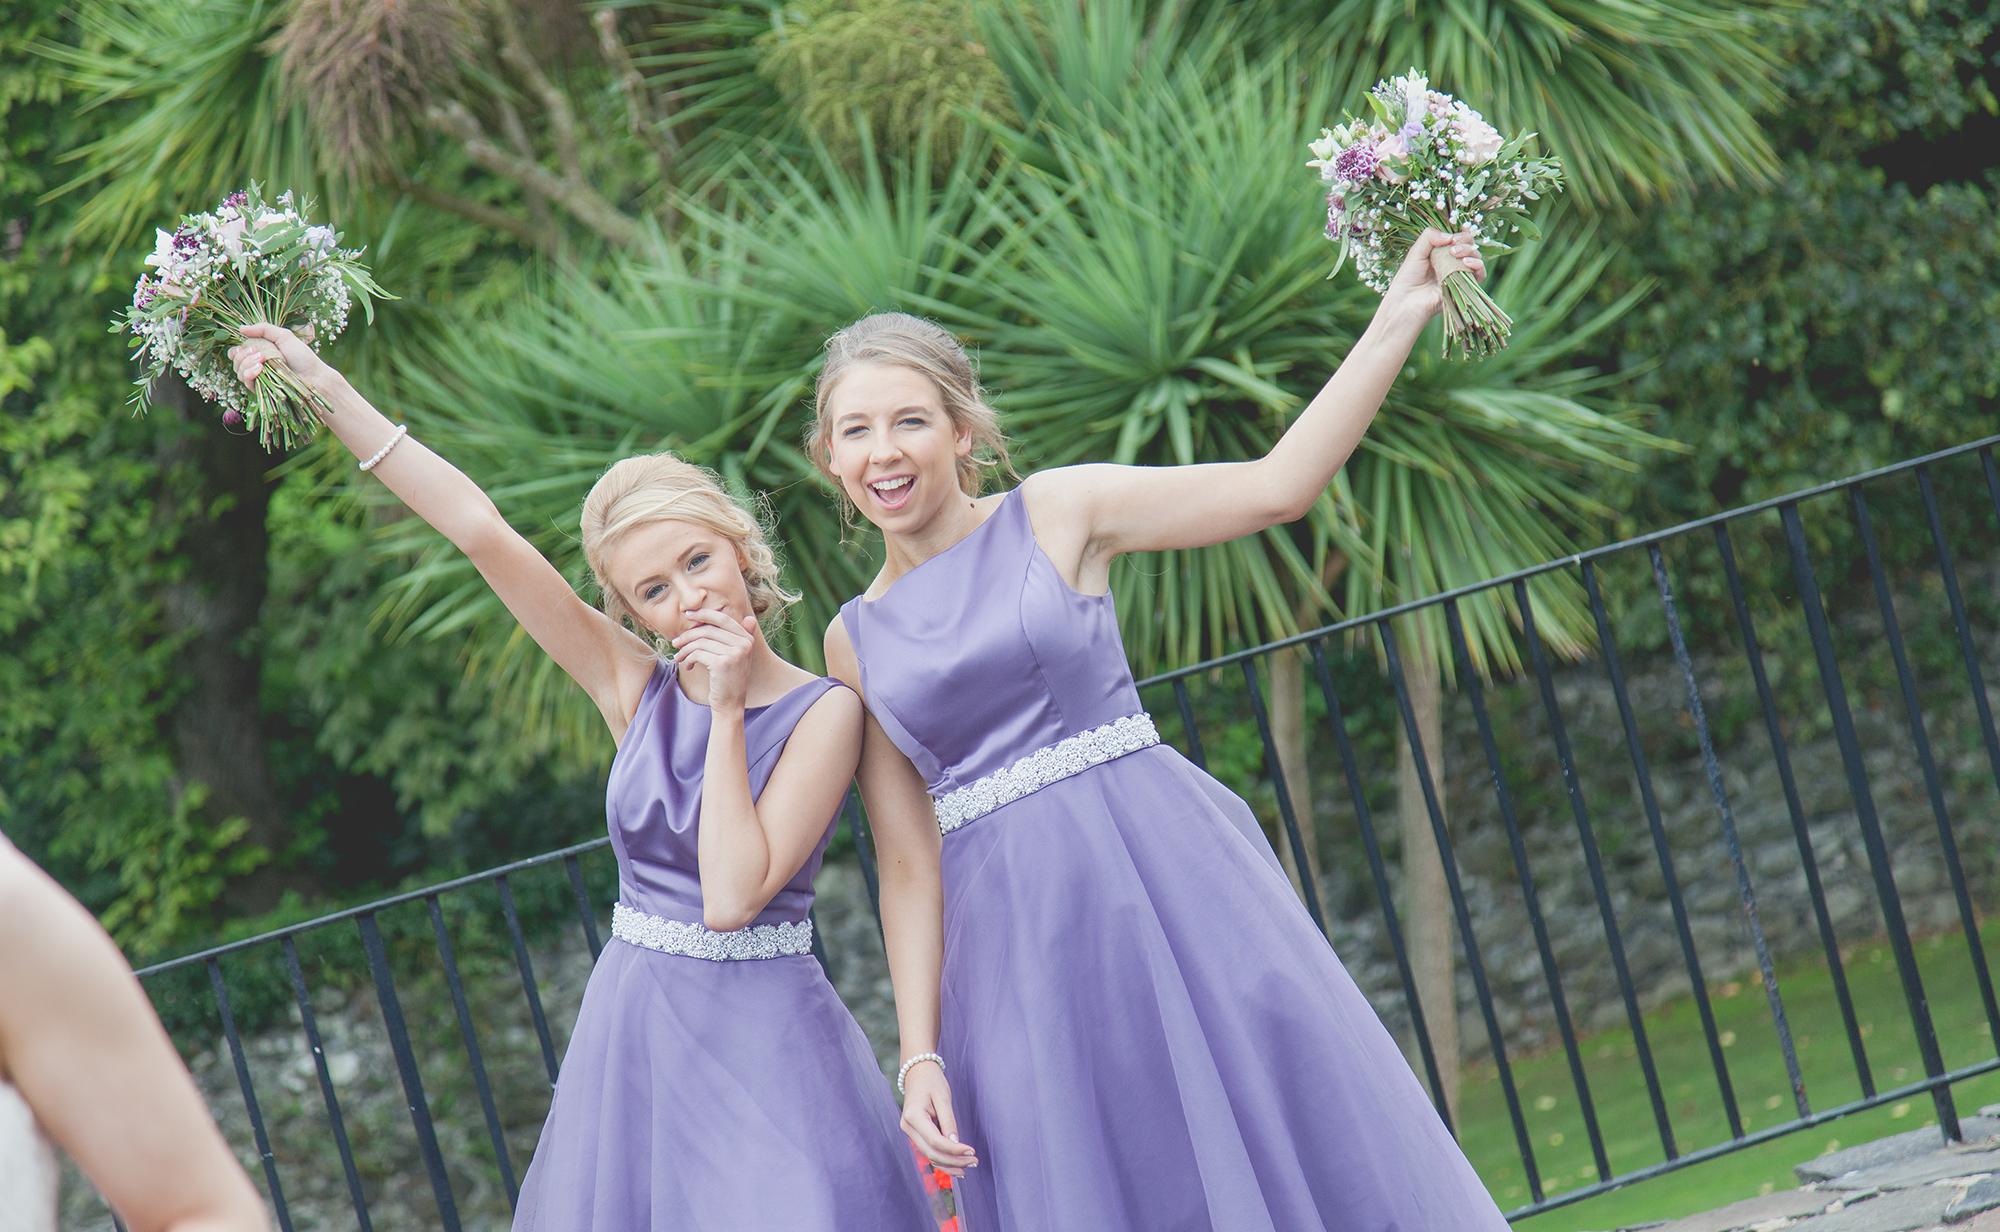 ballygally wedding photography tc photography larne belfast lisburn 18